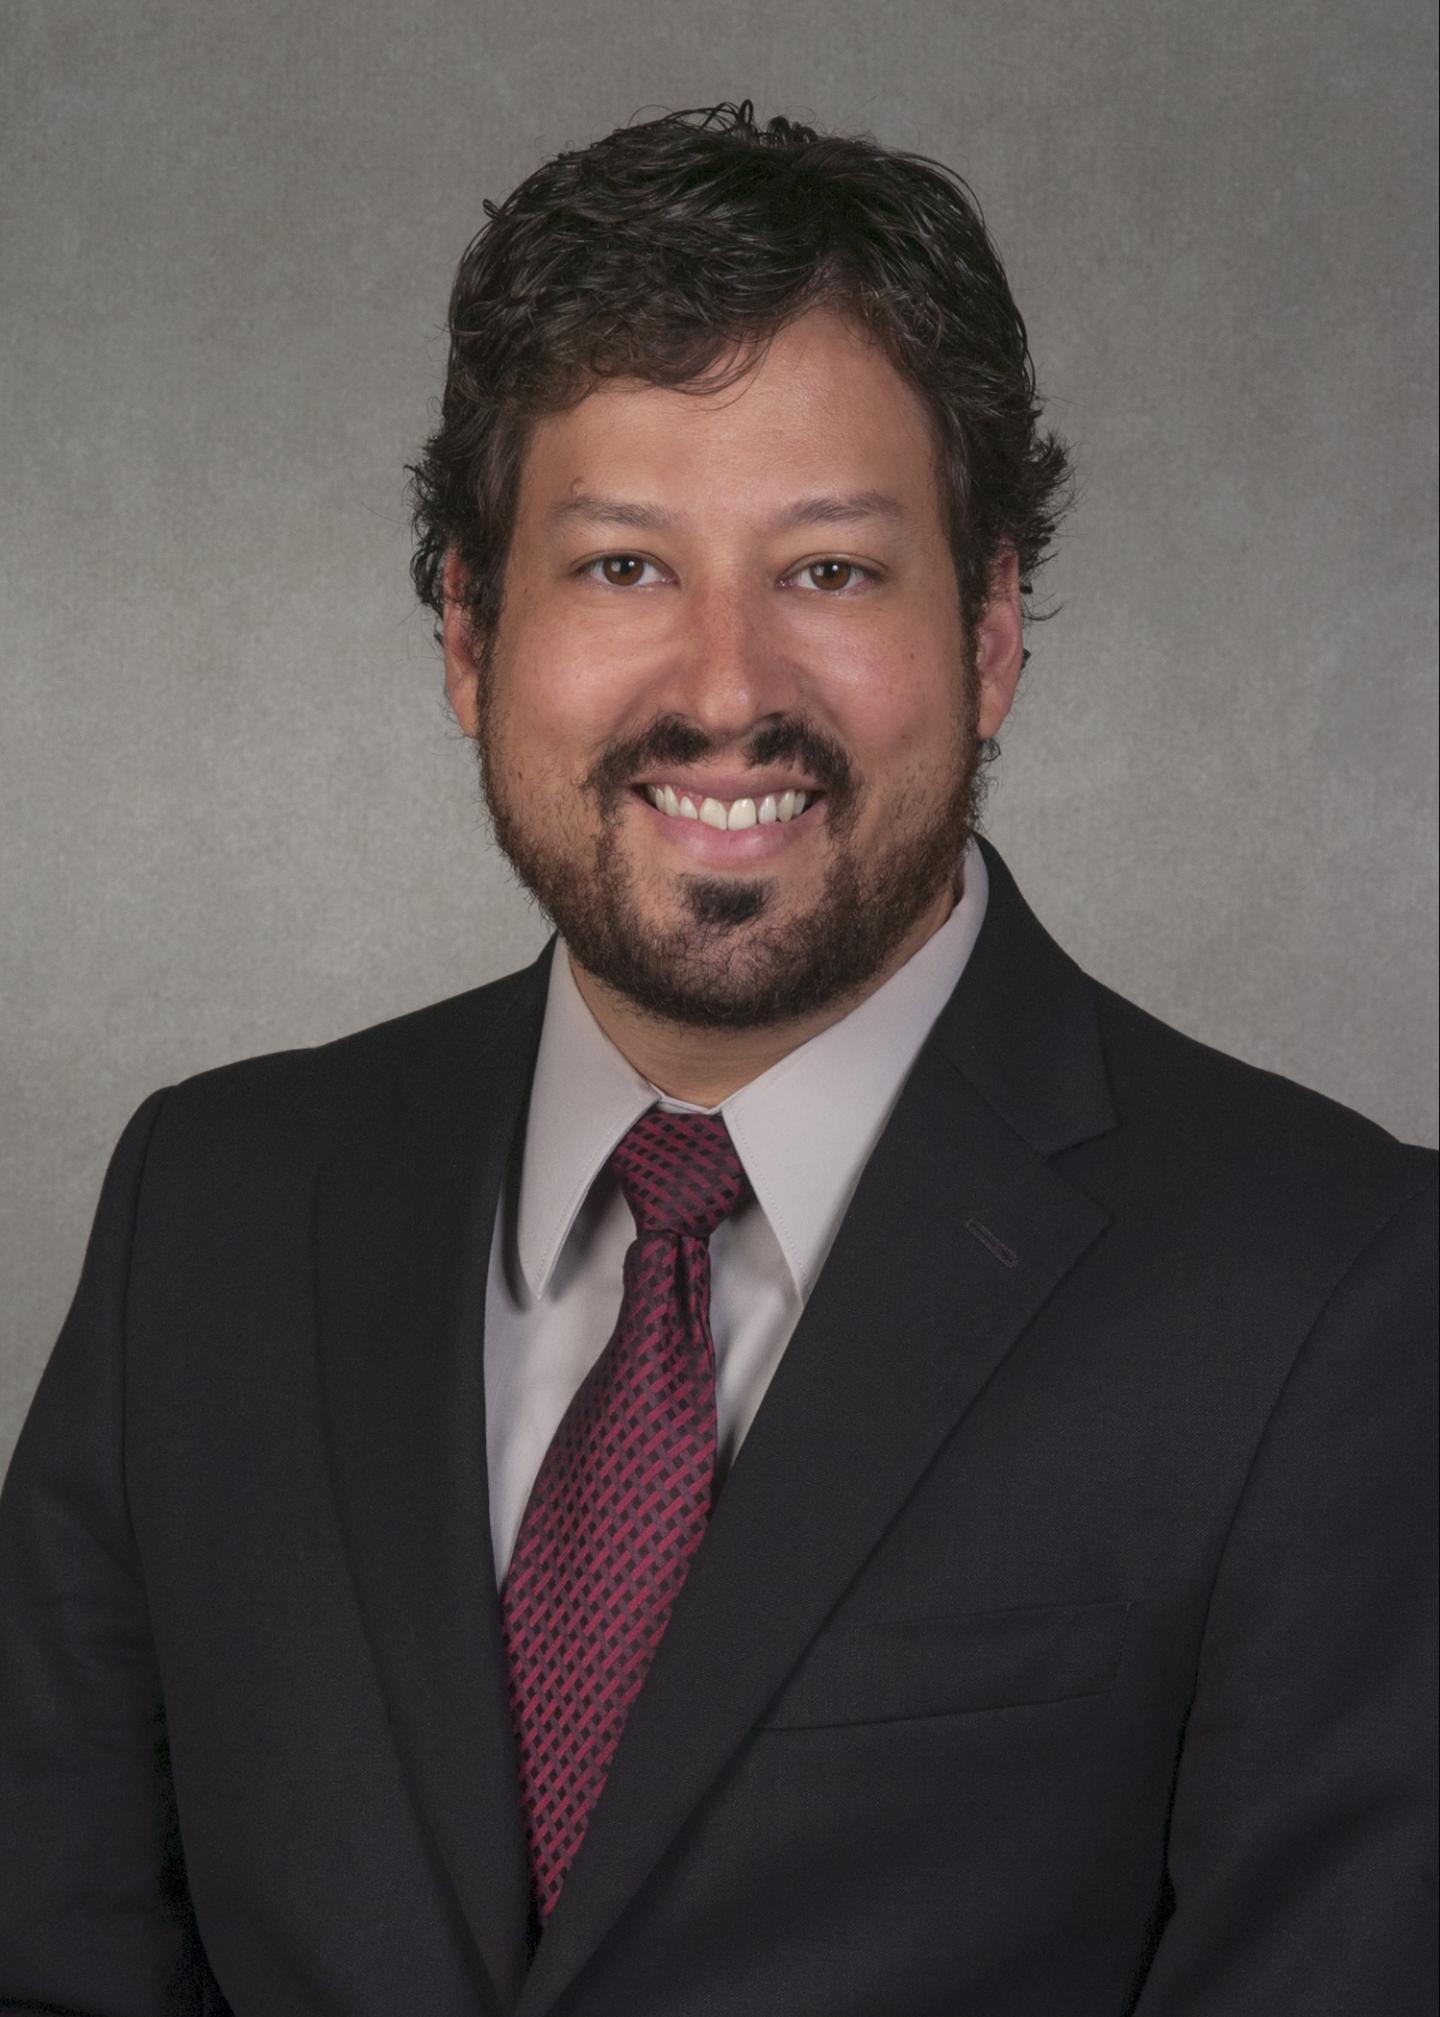 David Frisvold, University of Iowa